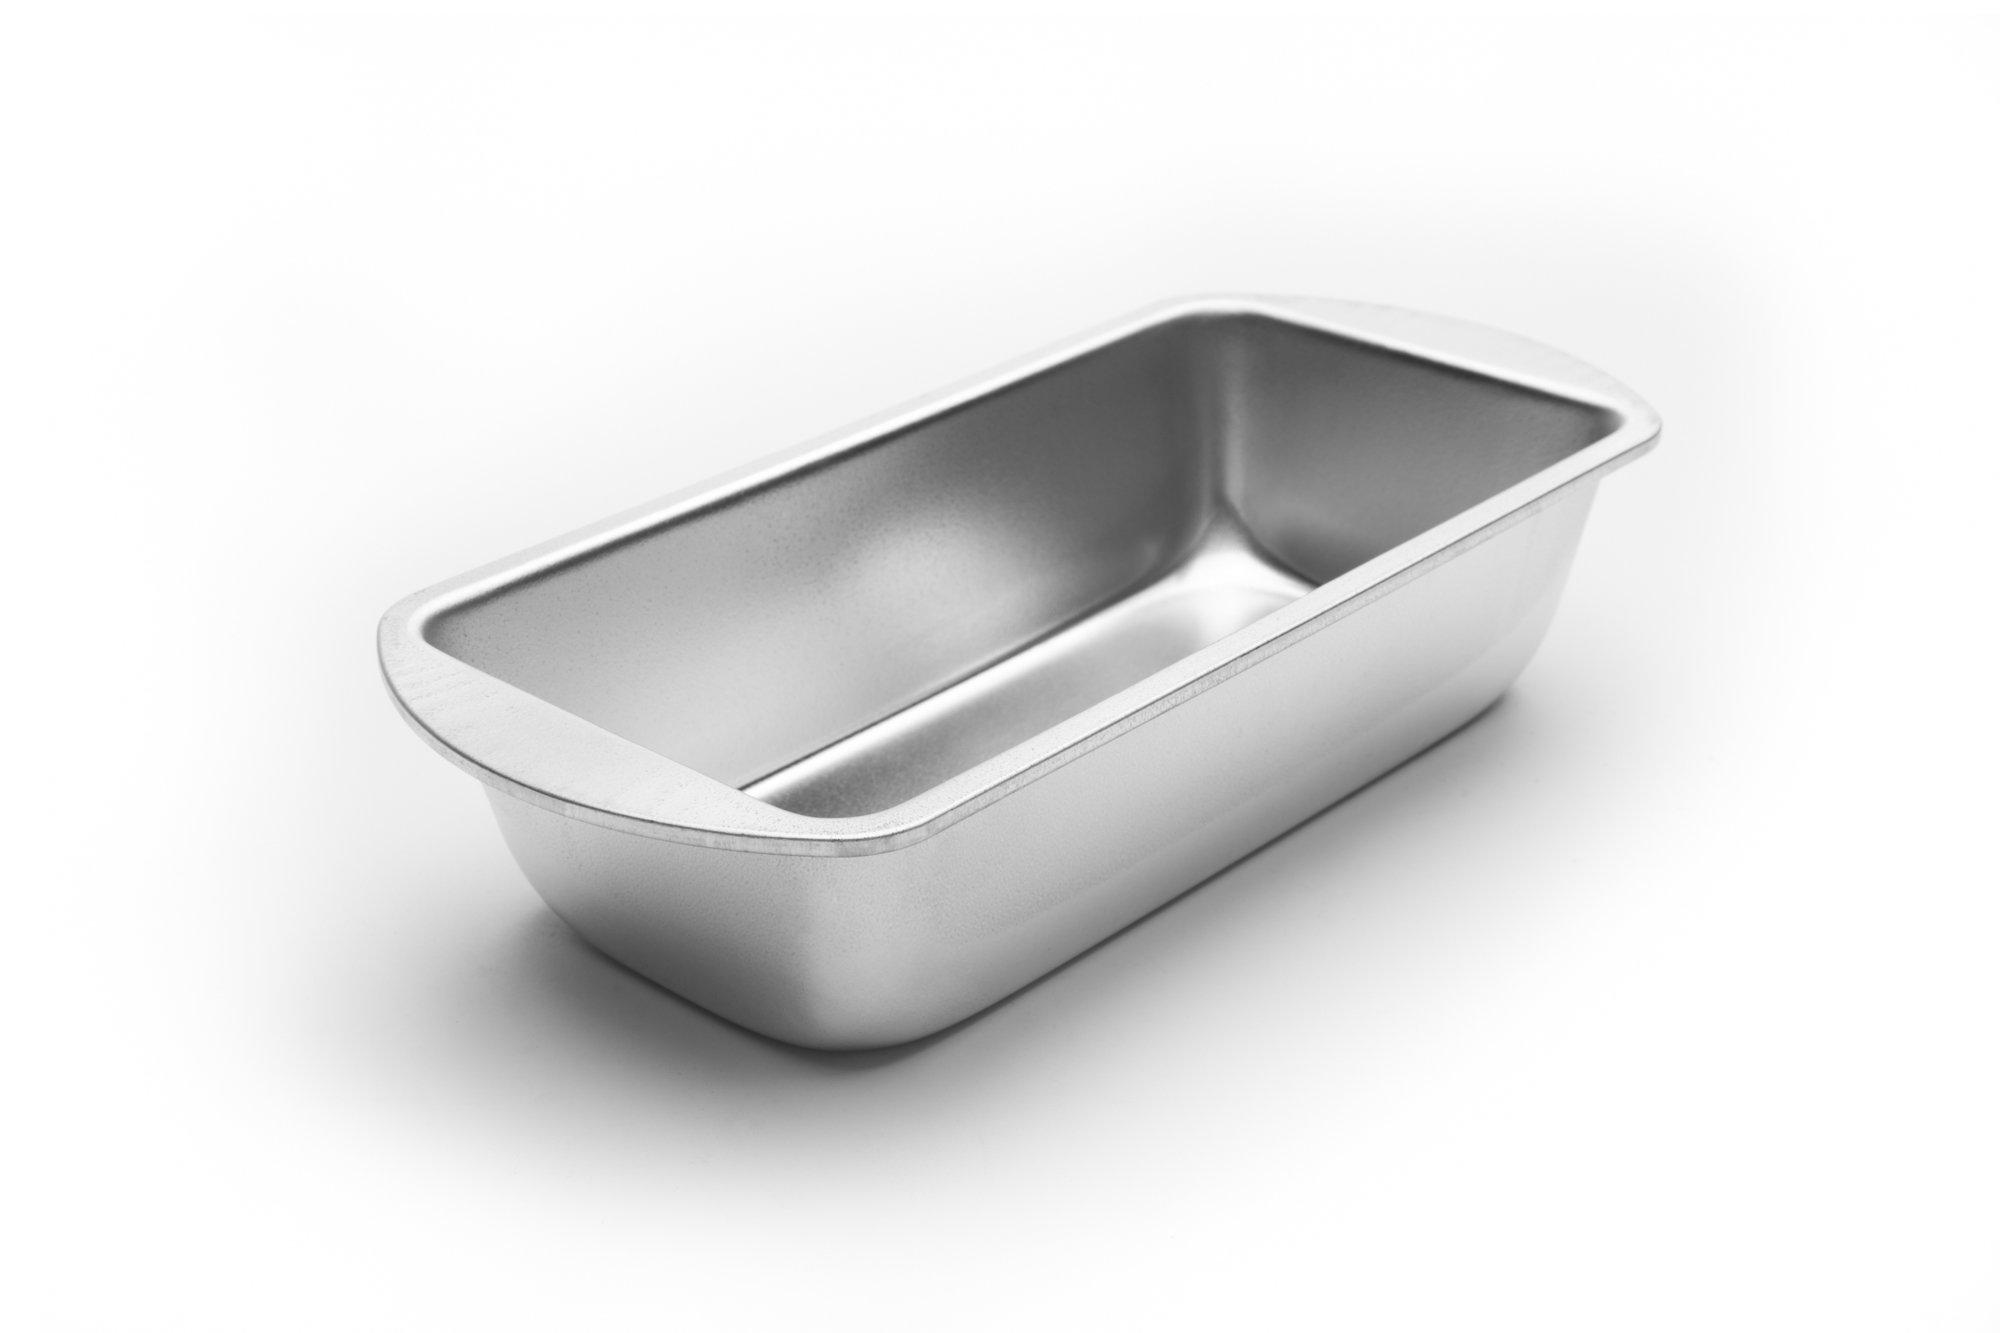 Fox Run 4670 Bread Pan, Tin-Plated Steel, 7.5-Inch by Fox Run